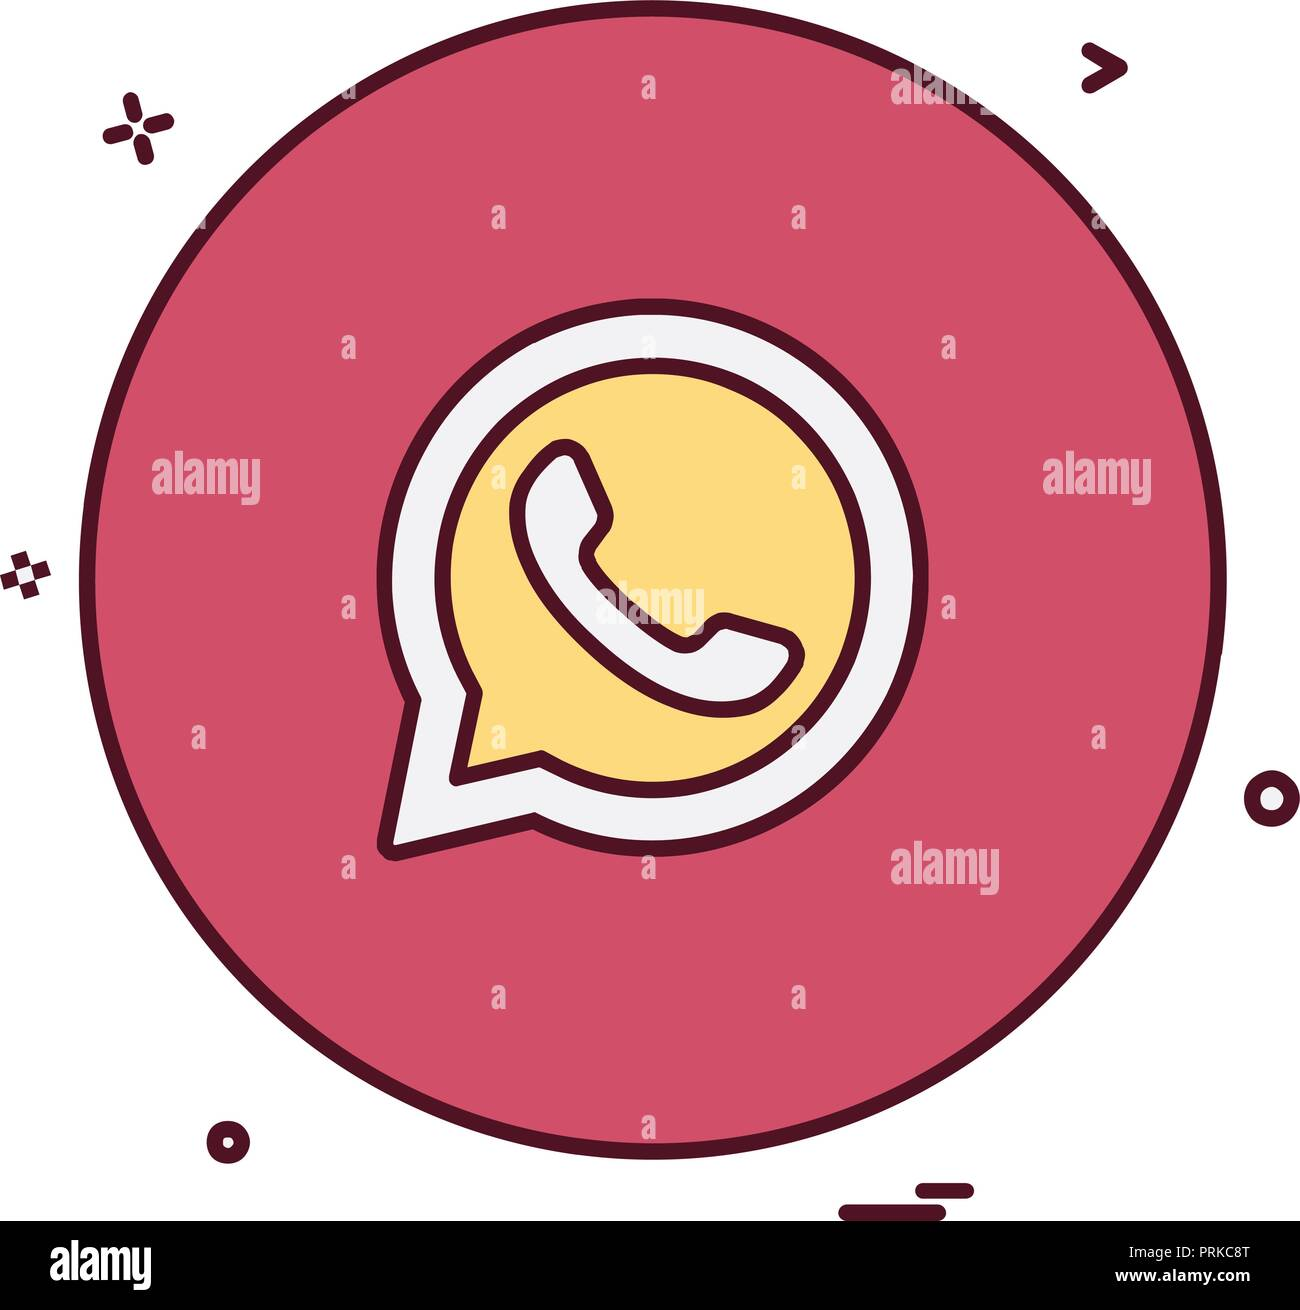 Whatsapp Icon Design Vektor Stock Vektorgrafik Alamy